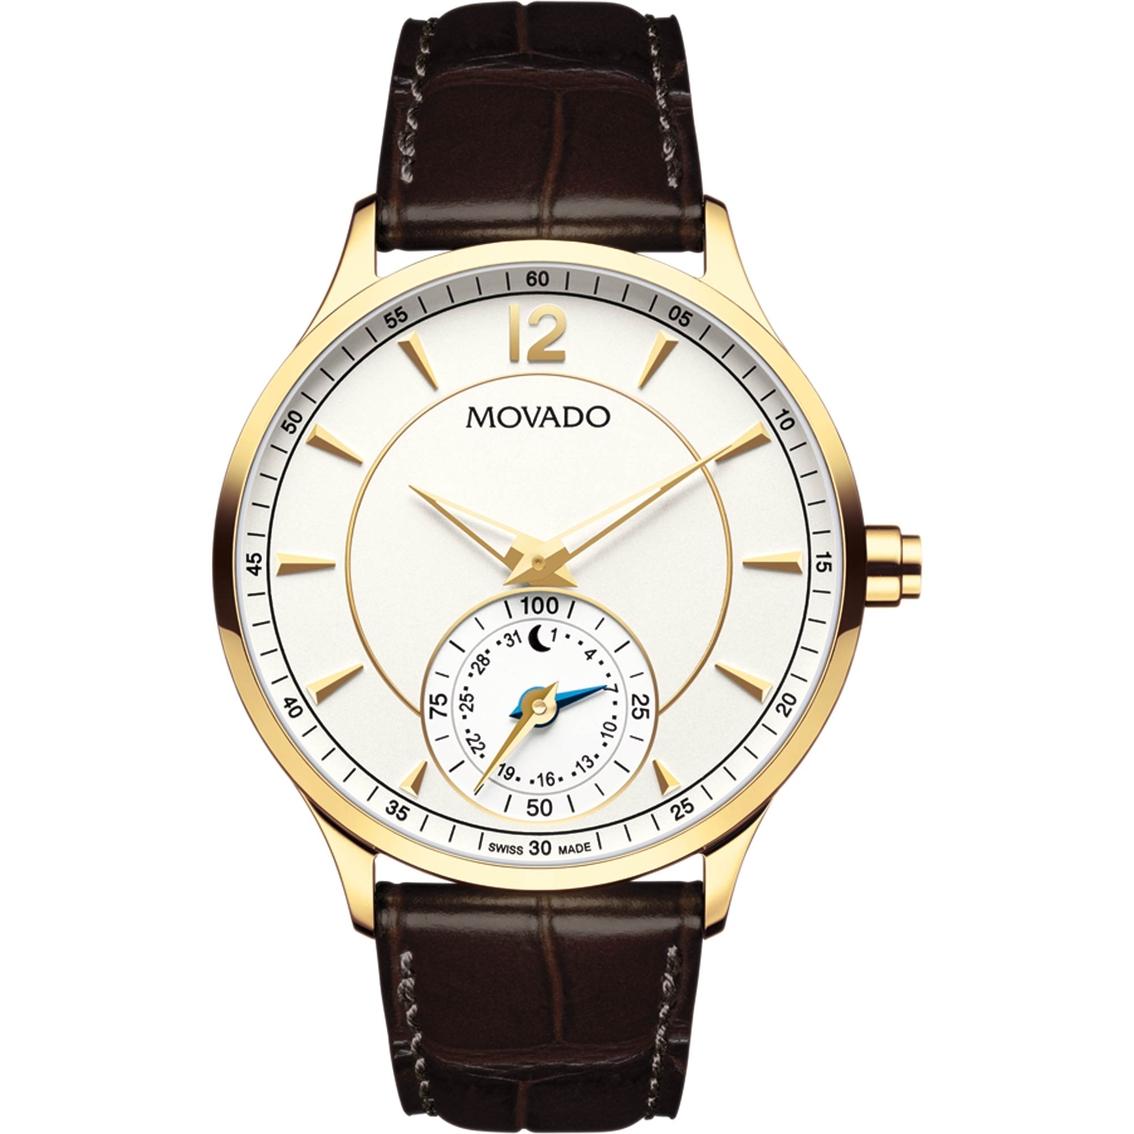 Movado Men S Move Circa Motion Brown Leather Strap Smart Watch